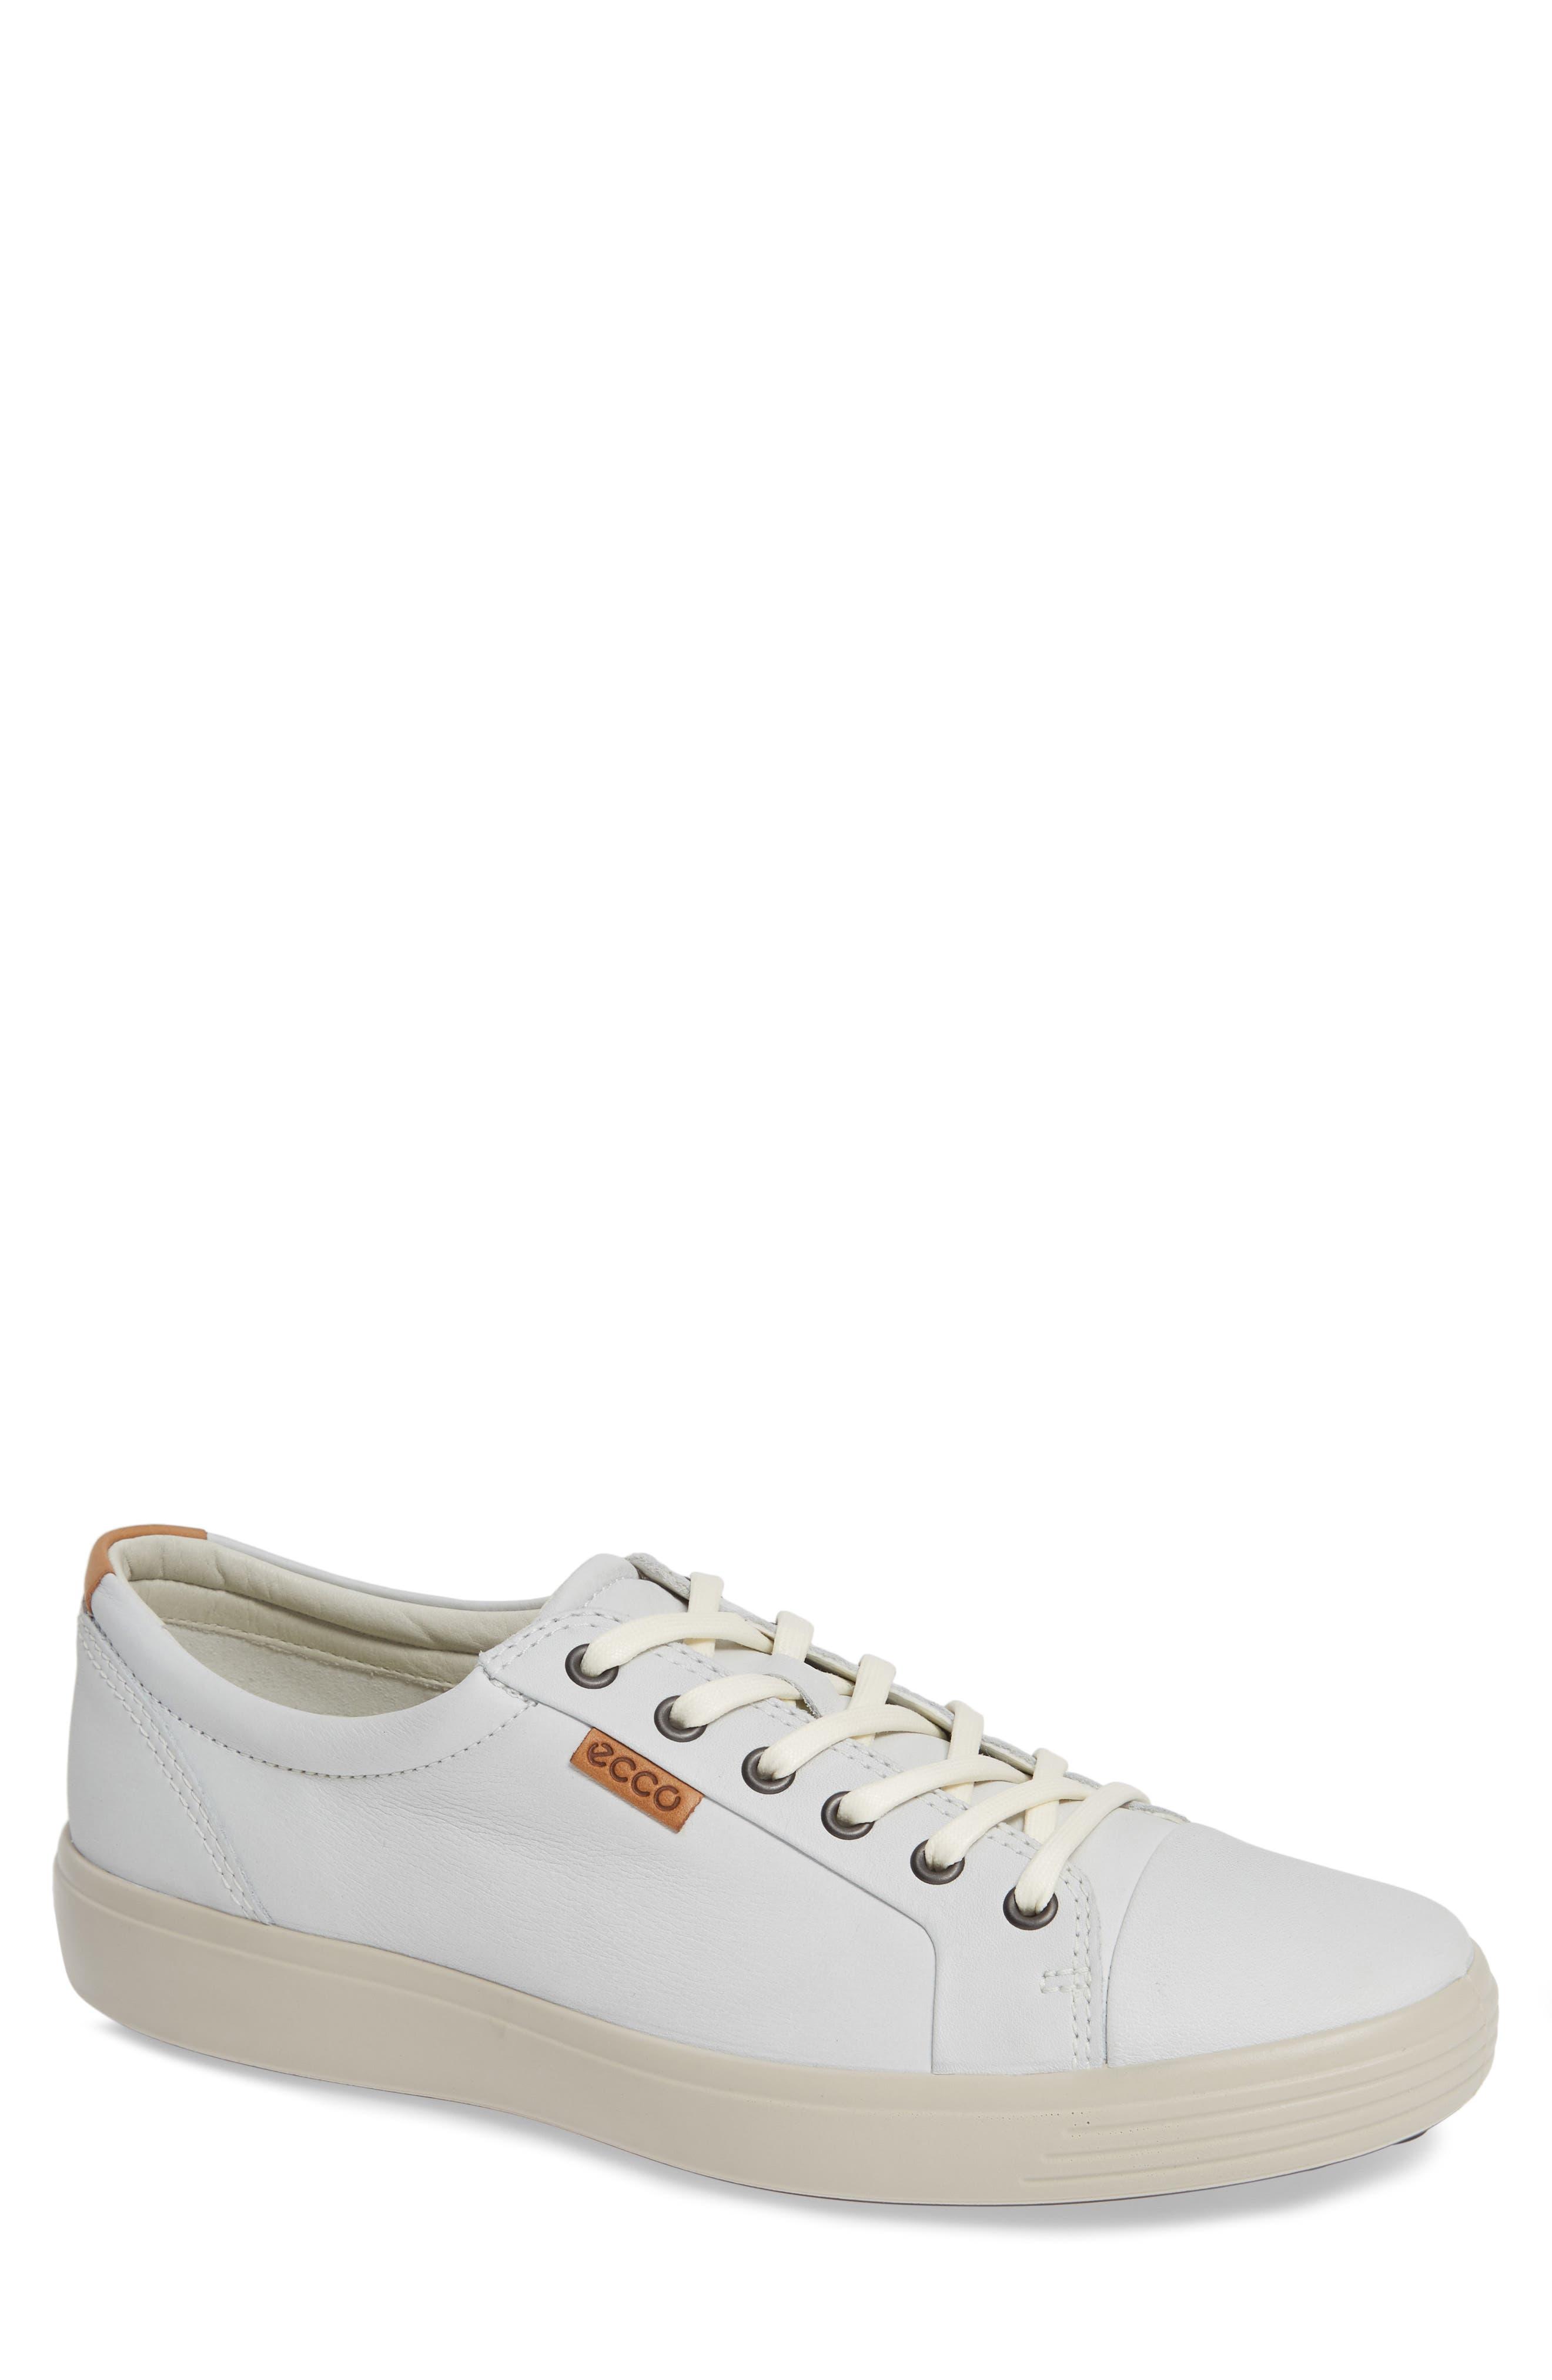 Ecco Soft Vii Lace-Up Sneaker,12.5 - White